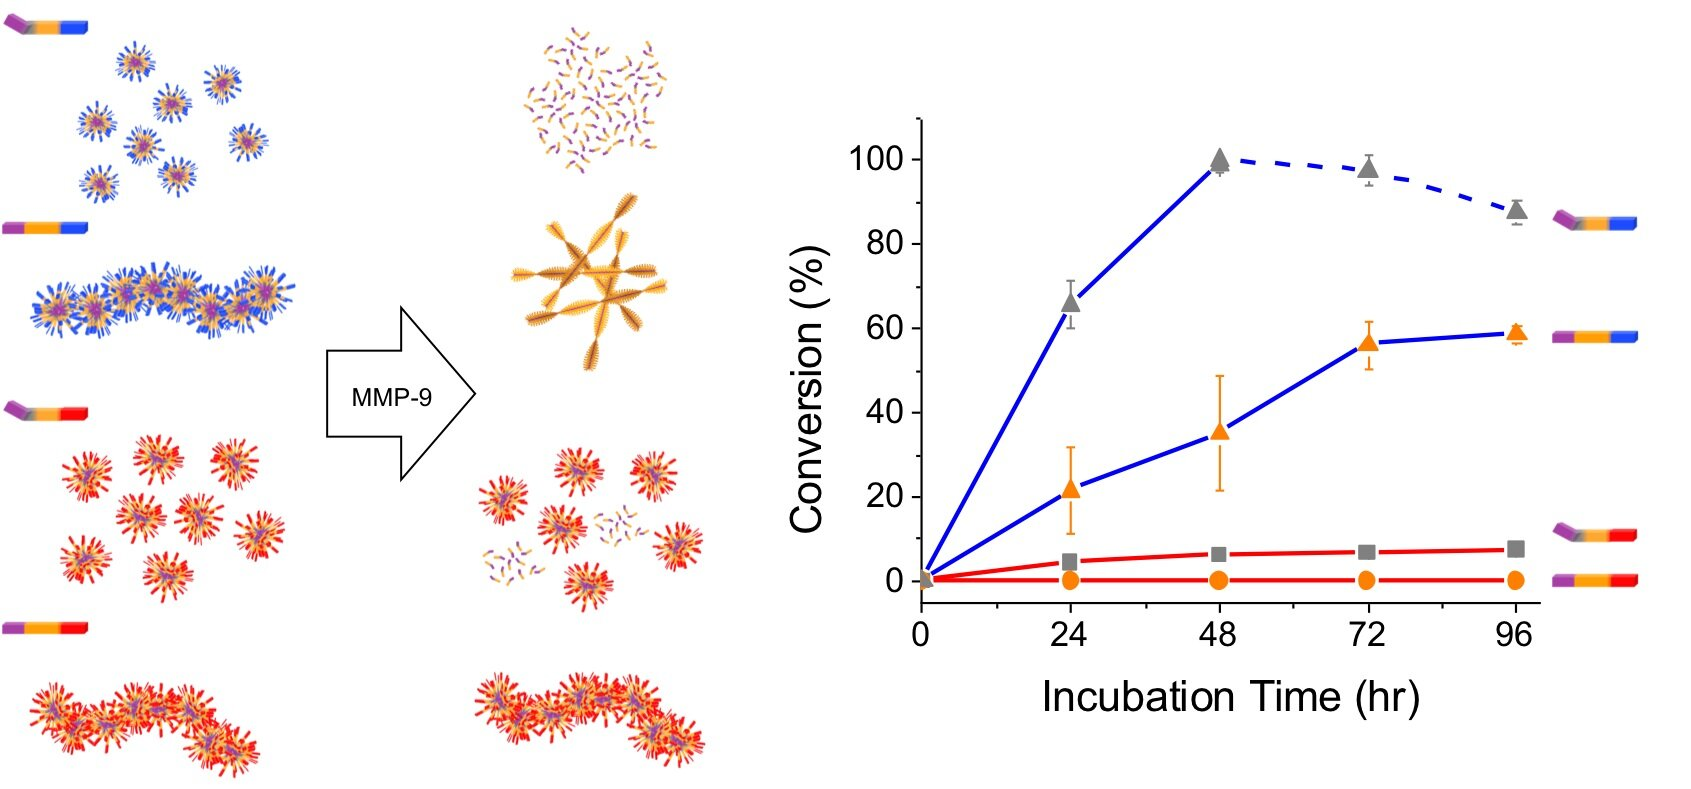 New paper provides design principles for disease-sensing nanomaterials